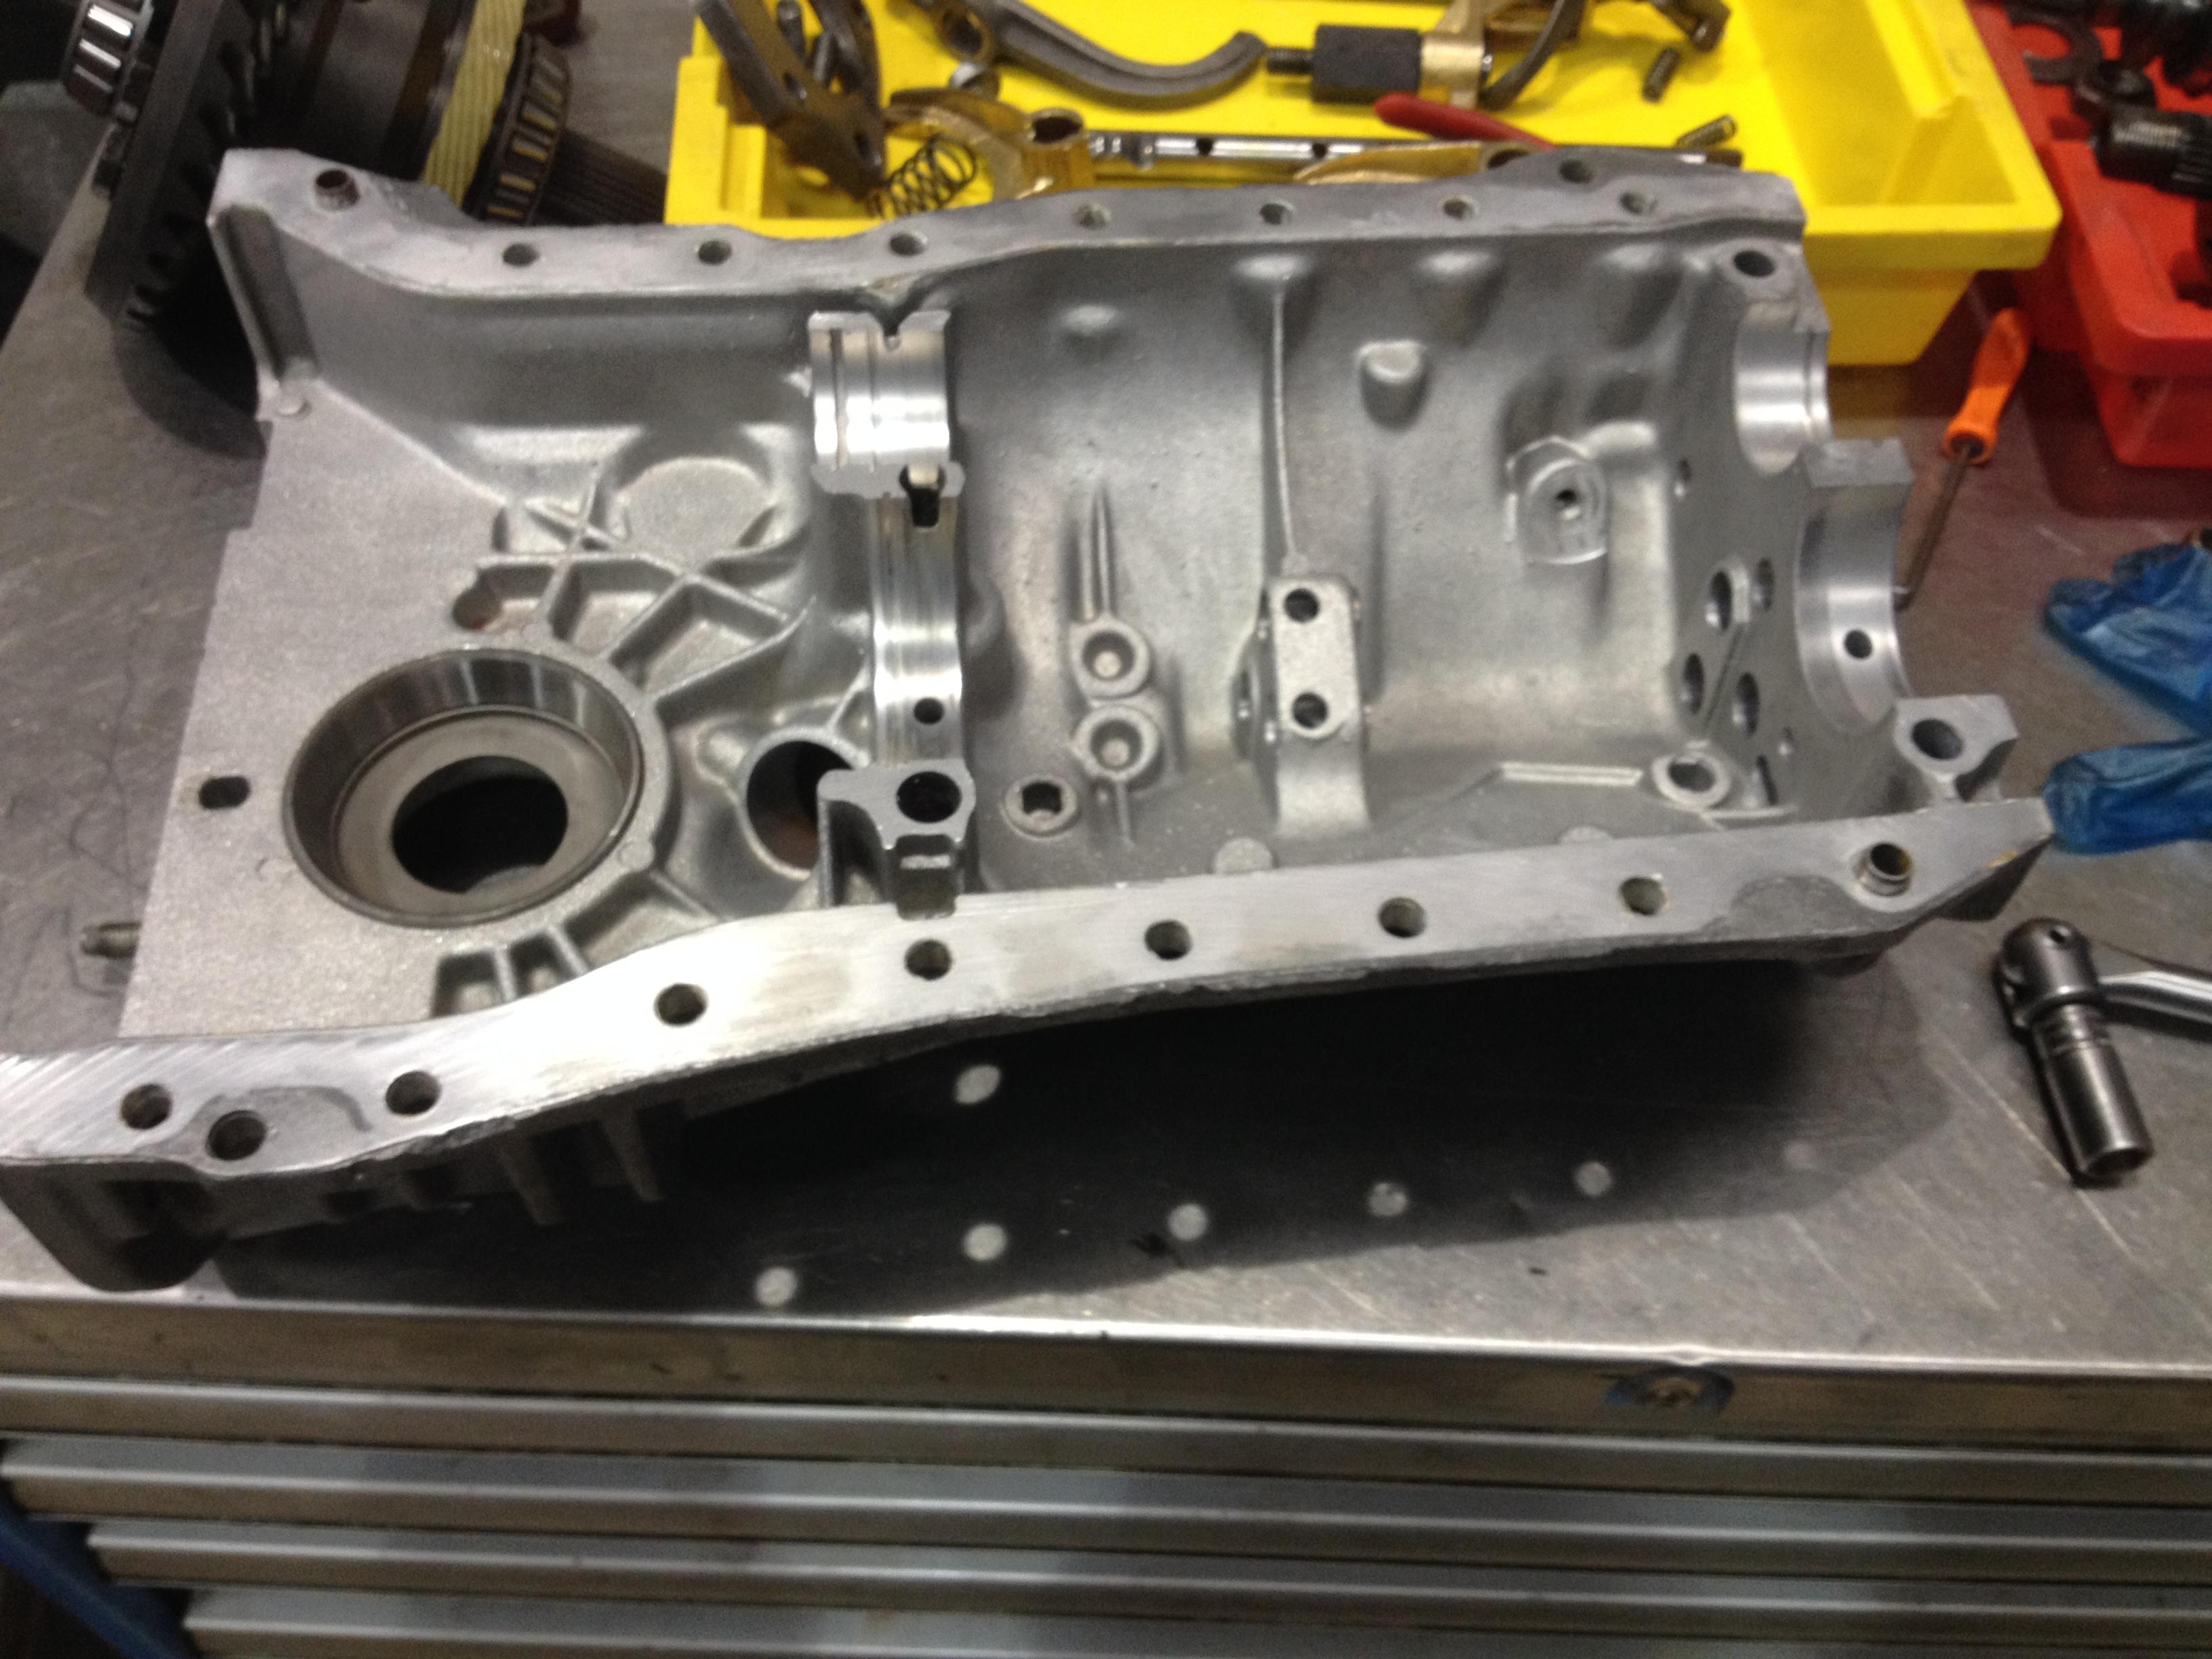 Lotus Esprit Renault UN1 Gearbox aqua Shot blasting at Esprit Engineering - Gearbox Rebuilding Service - V8 S4S S4 SE X180